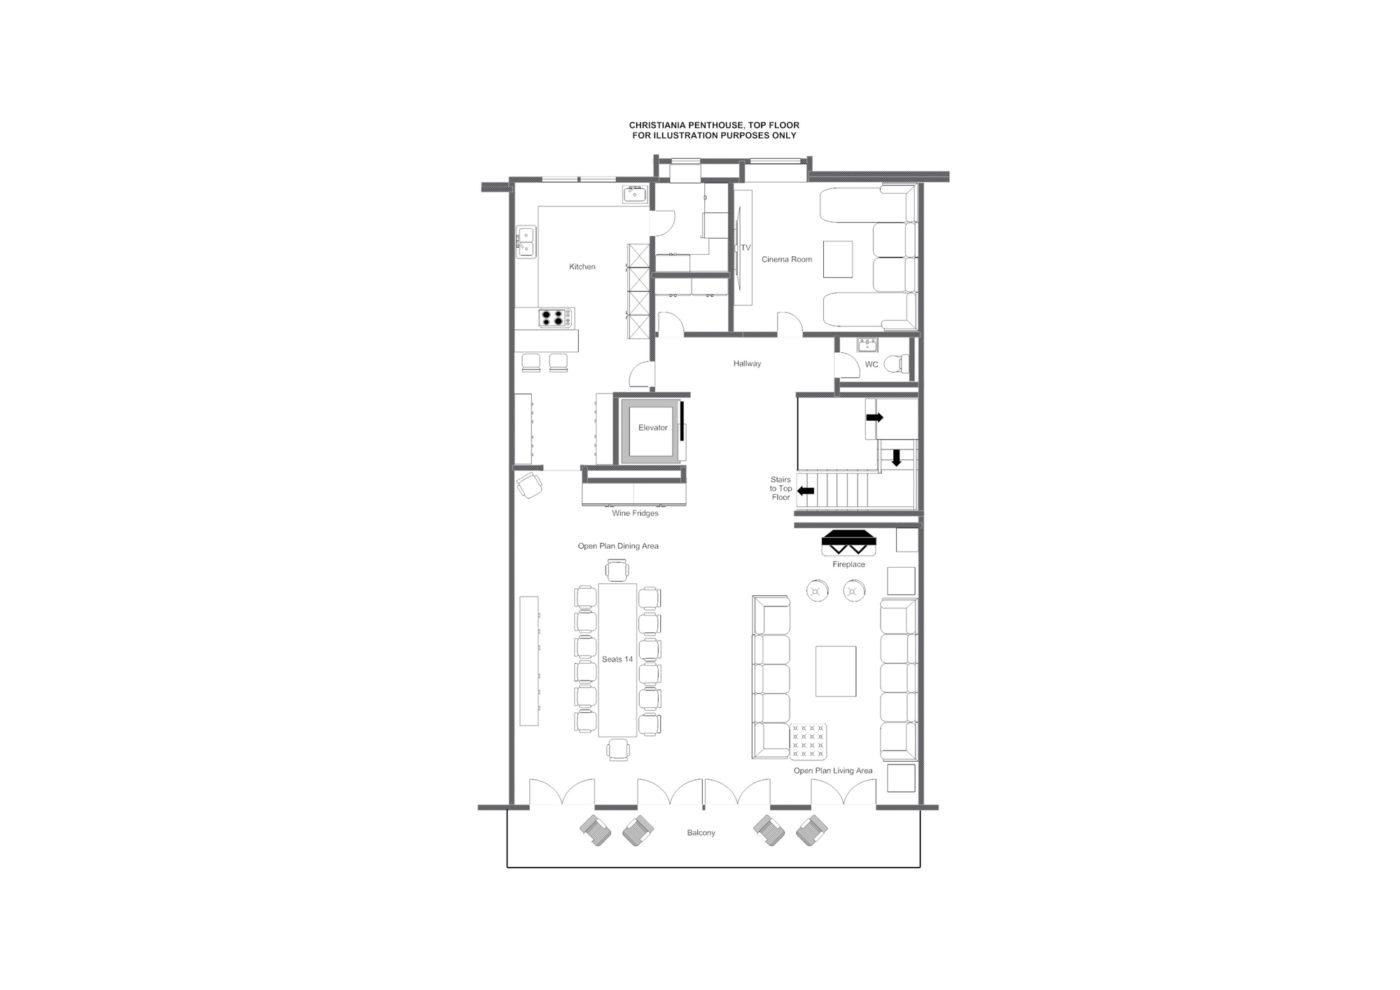 Christiania Penthouse floor plans, Zermatt.